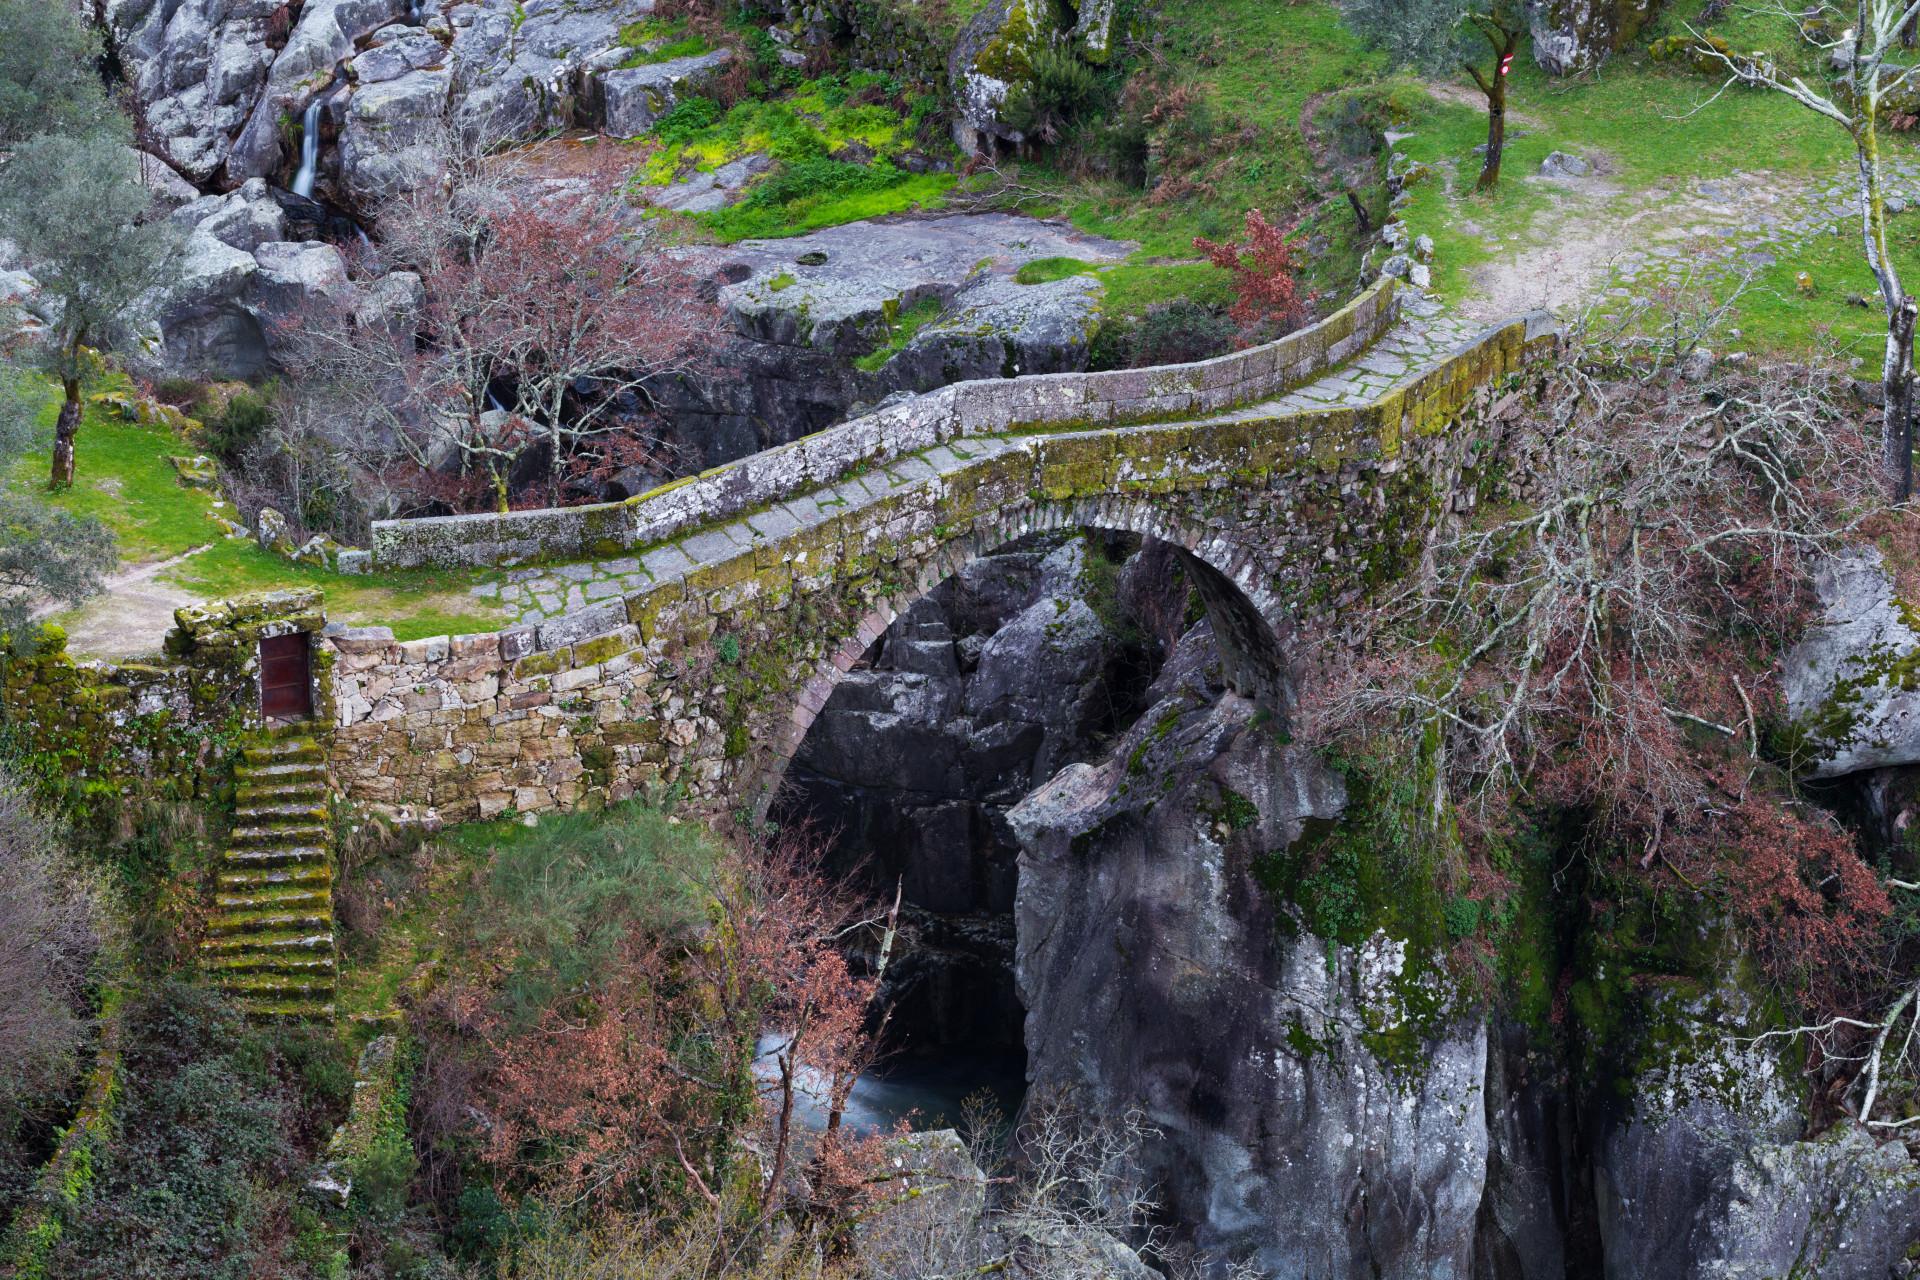 Do you dare cross the Devil's bridge?